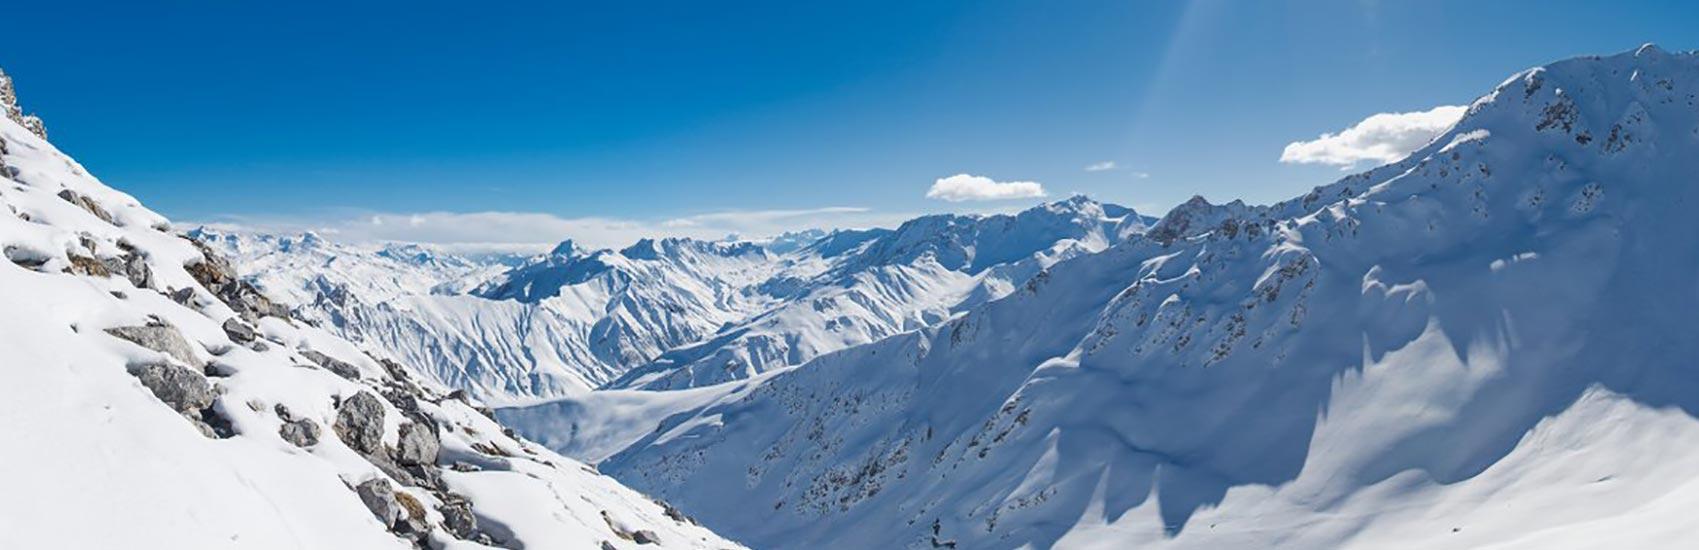 Ski Getaways on Sale with Club Med 5